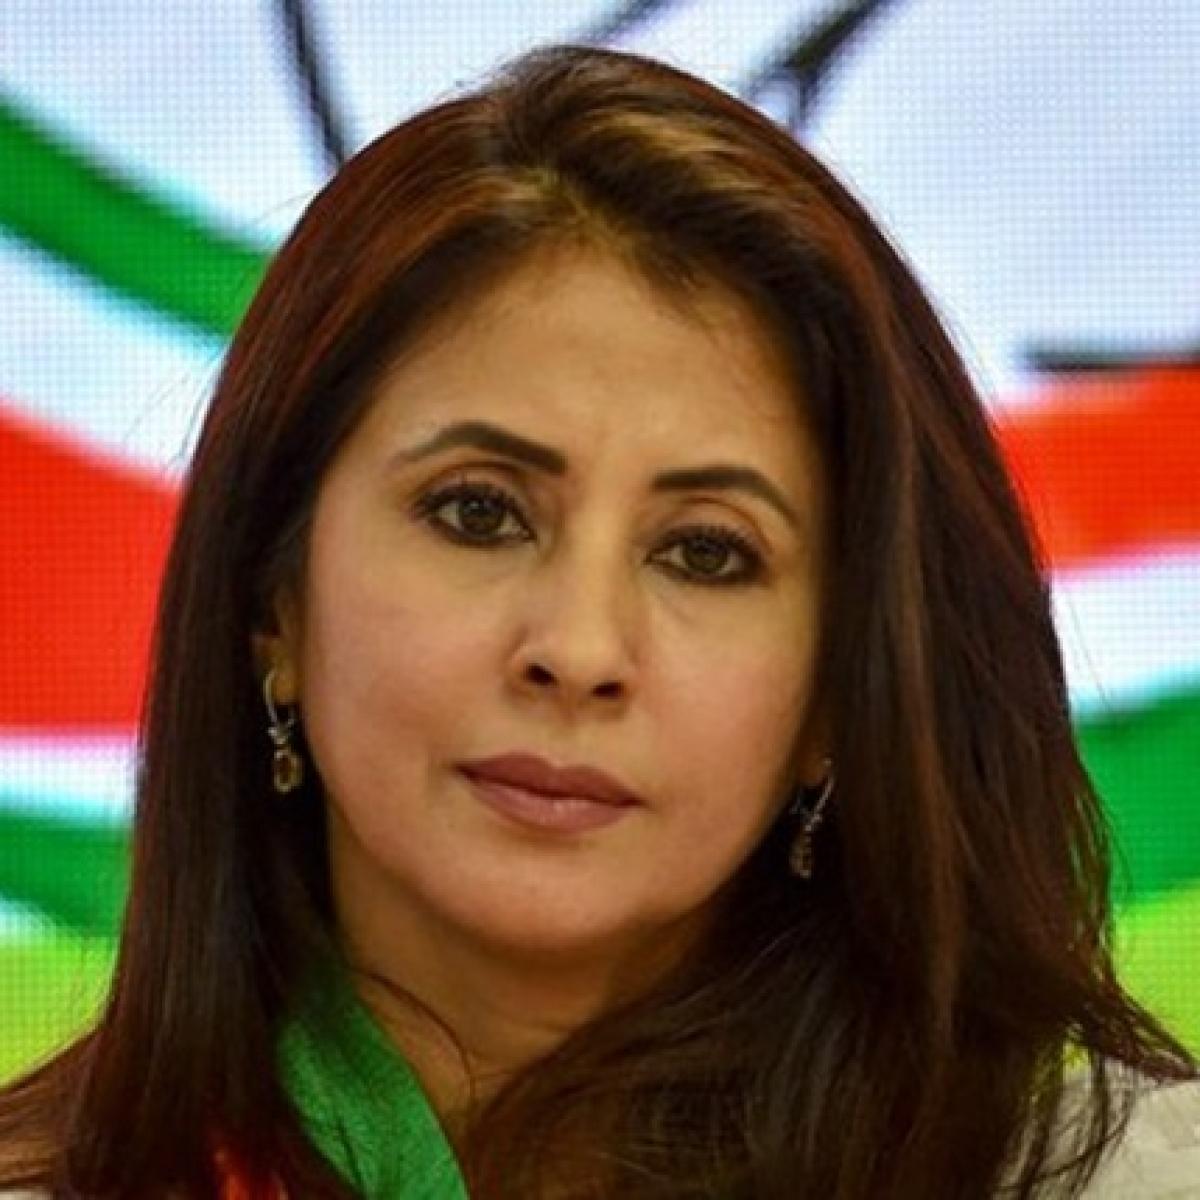 Now, Urmila Matondkar quits Congress, cites petty in-house politics as reason behind resignation